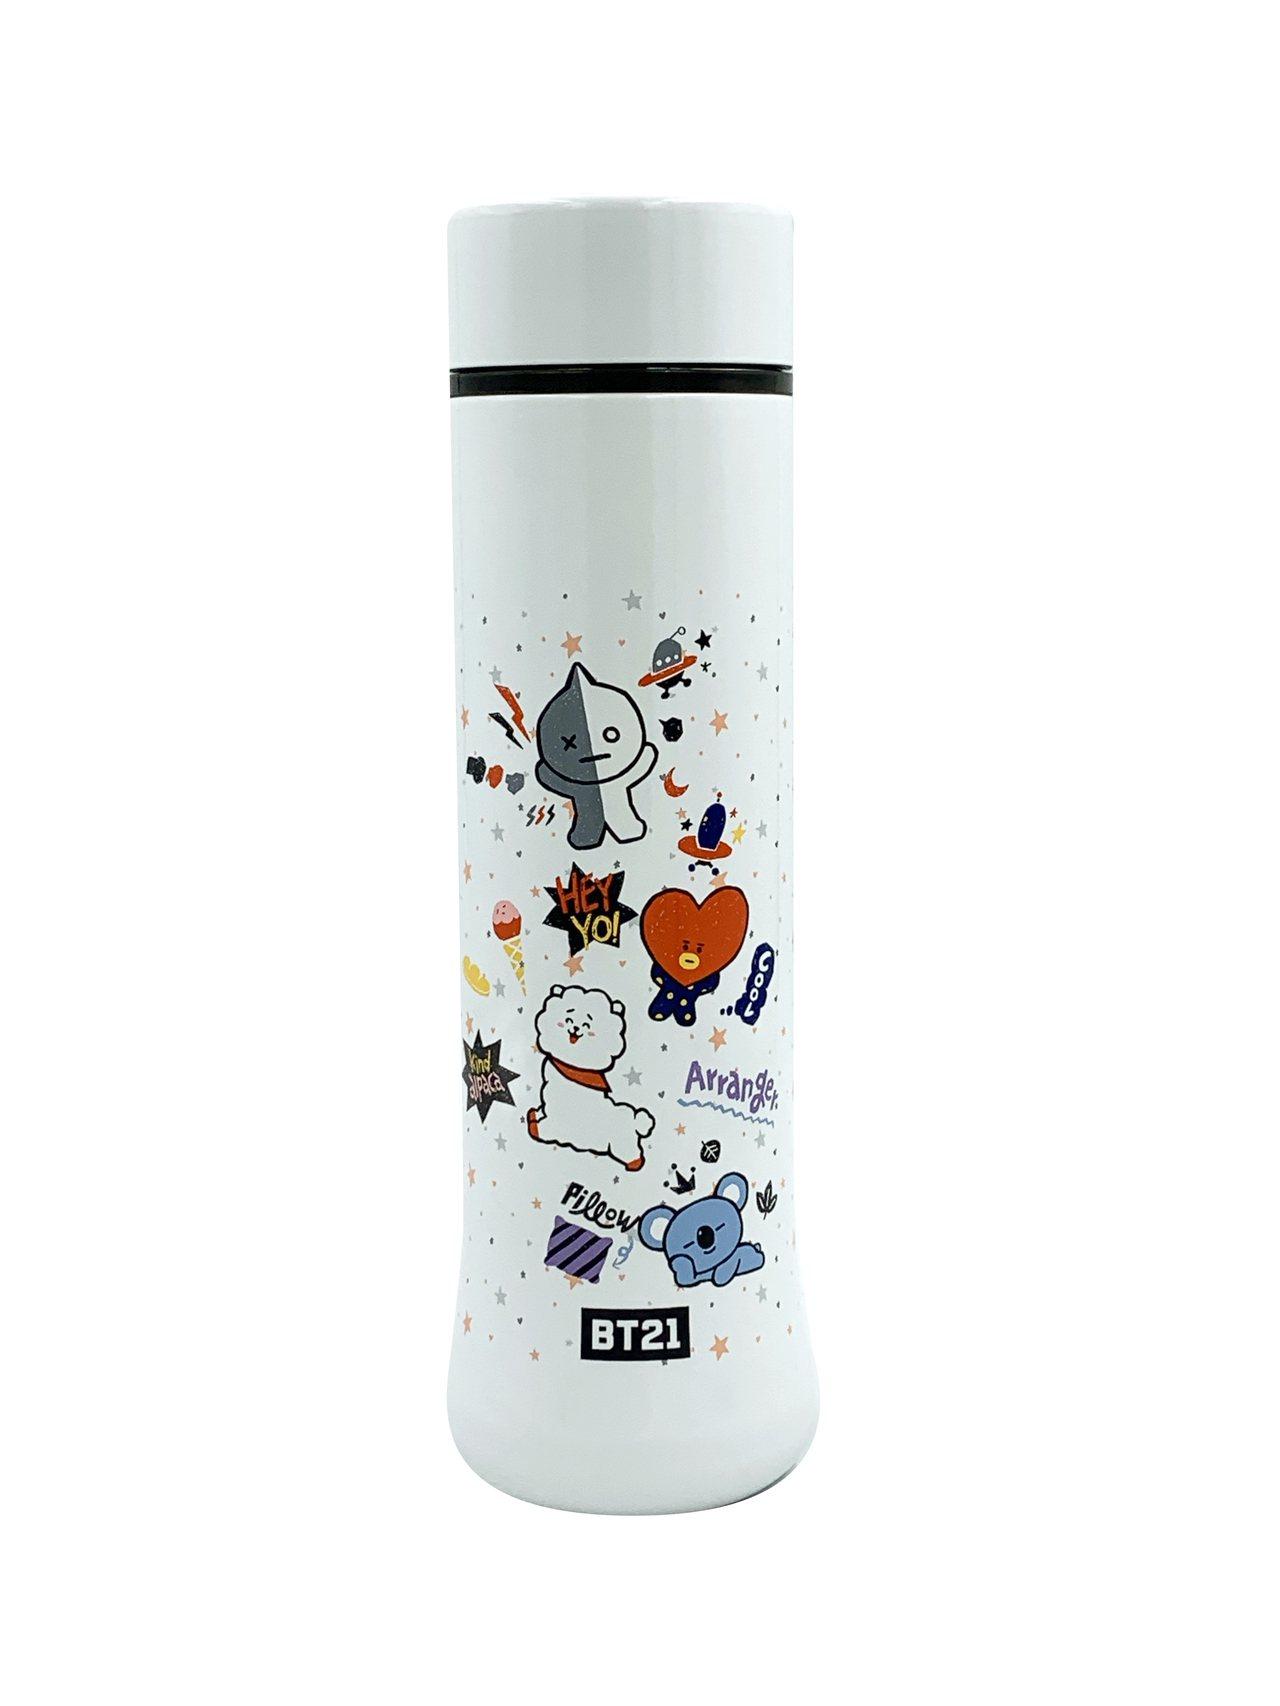 「BT21」保溫瓶-歡樂款,2,000點+779元,12月4日起於全家便利商店A...